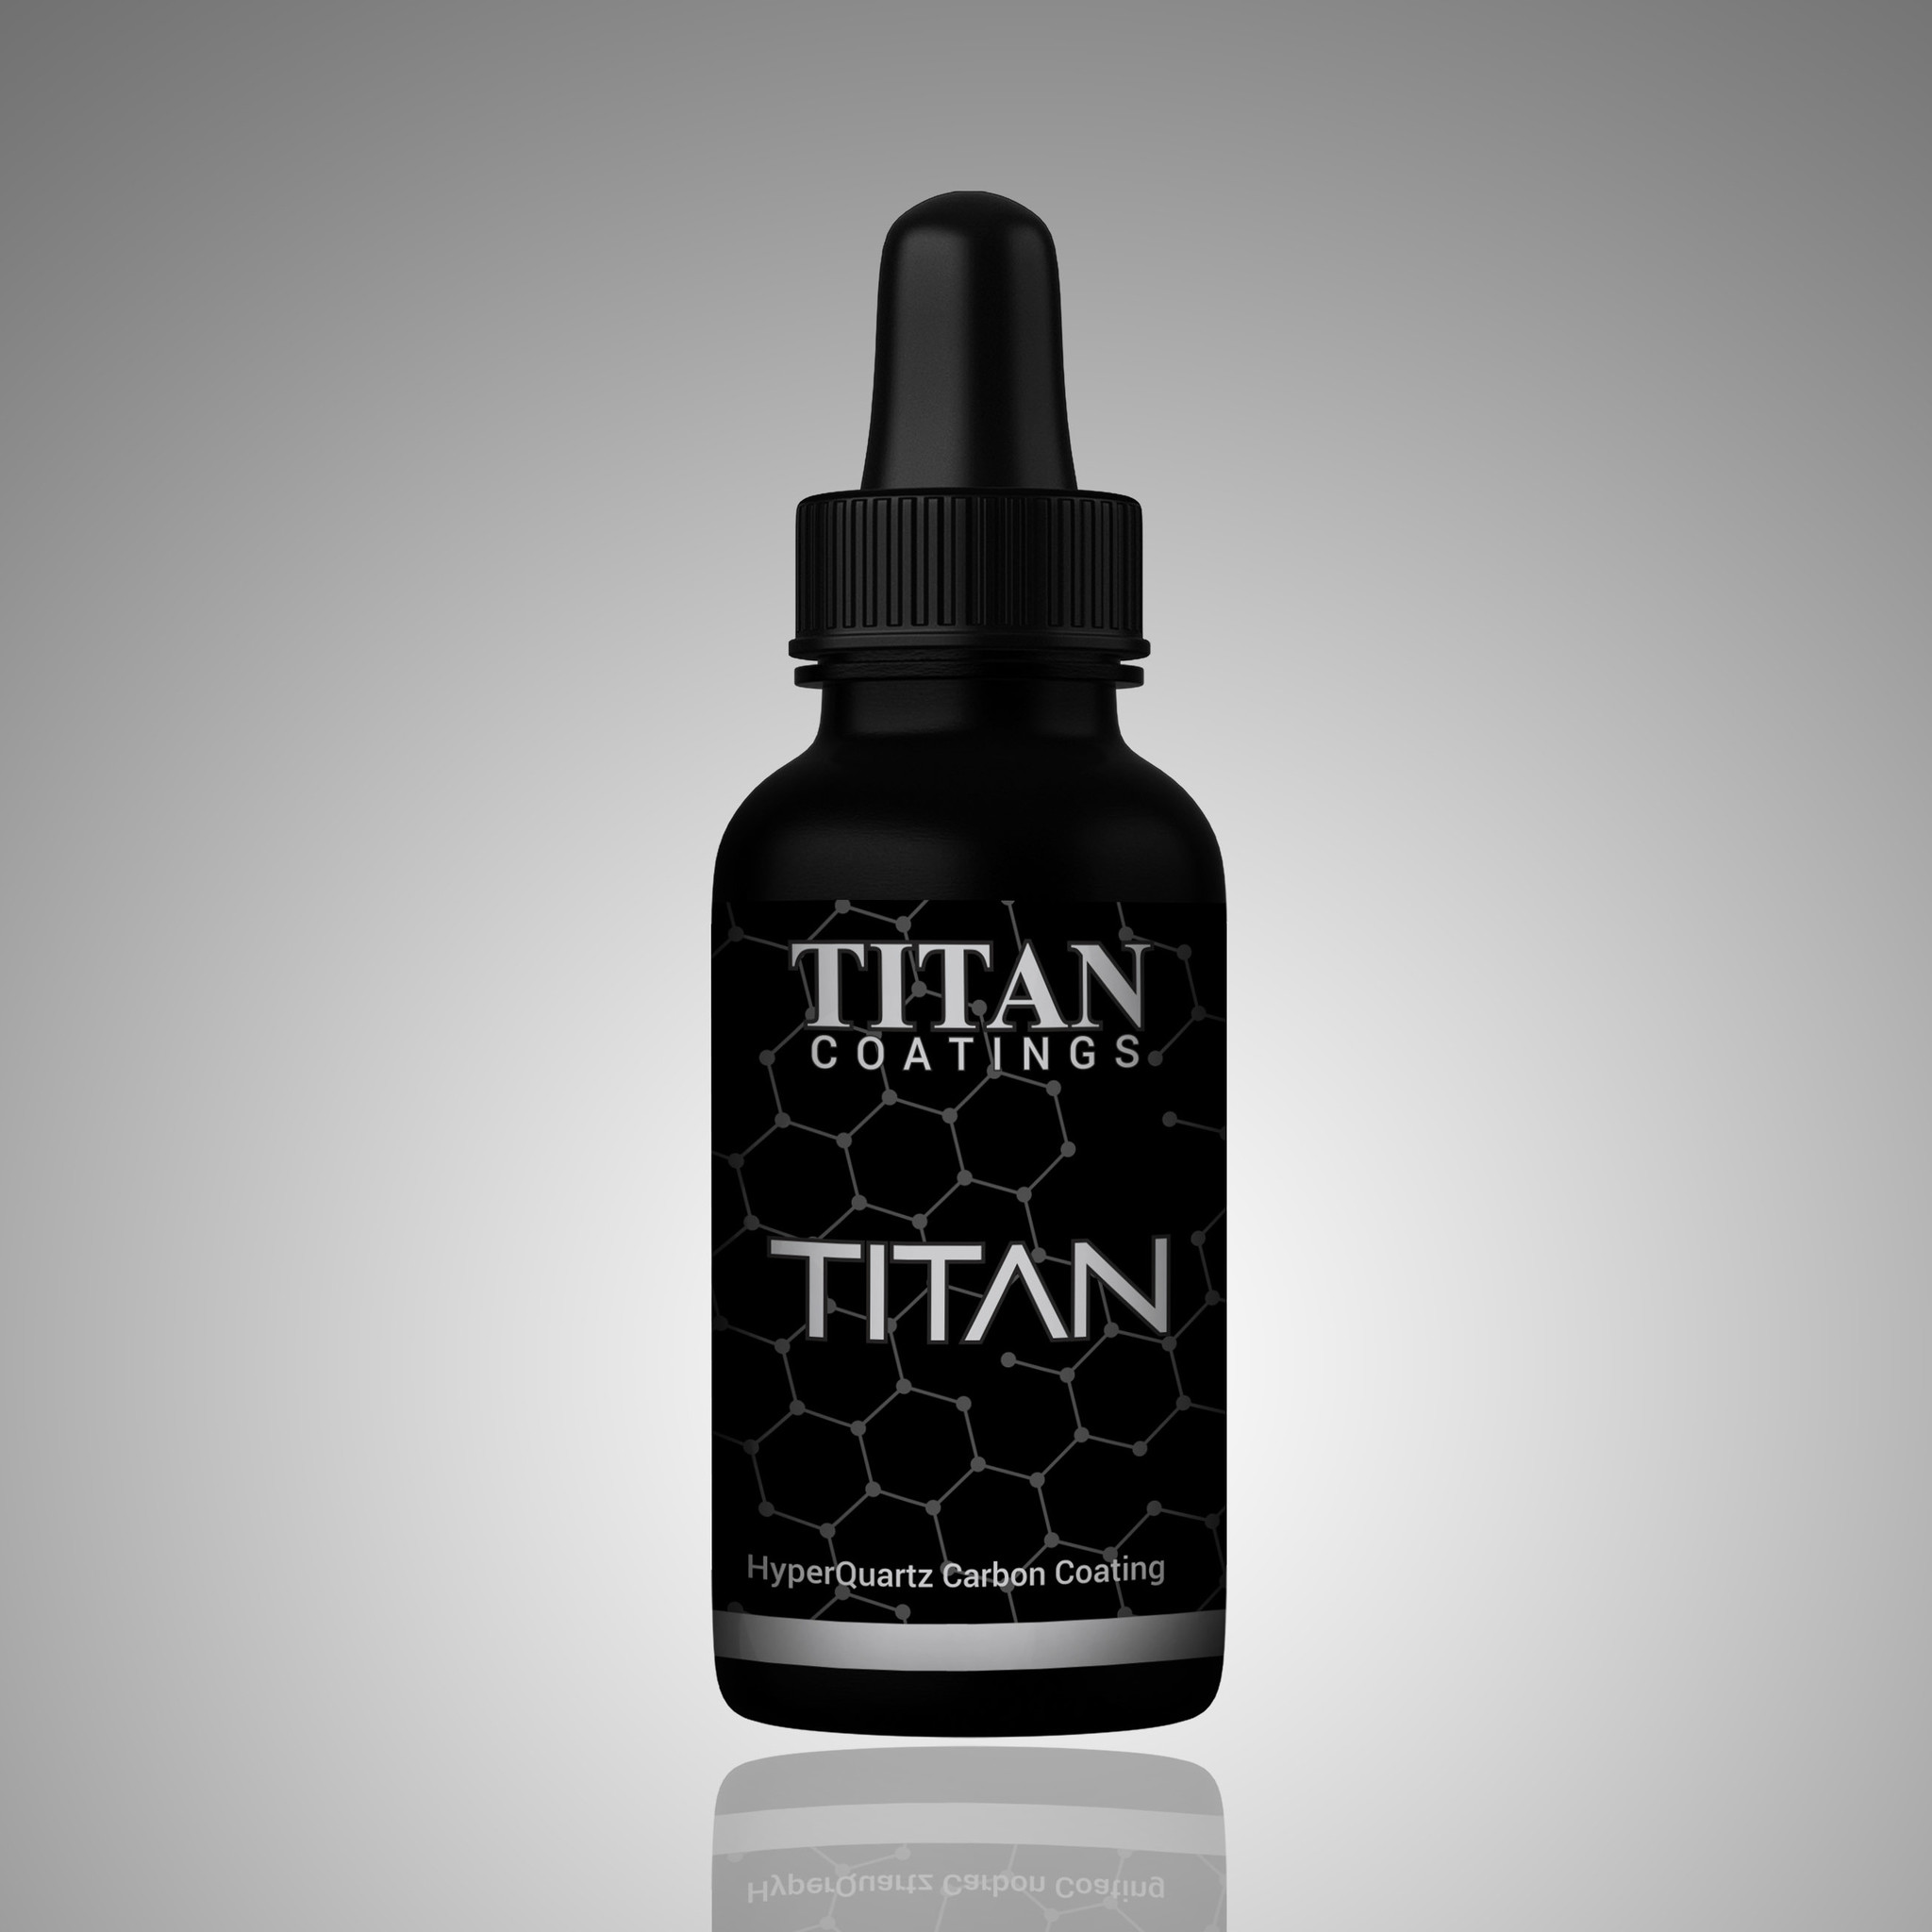 Titan Coatings UK TITAN - Hyper Quartz Carbon Glasscoat Coating 50ml